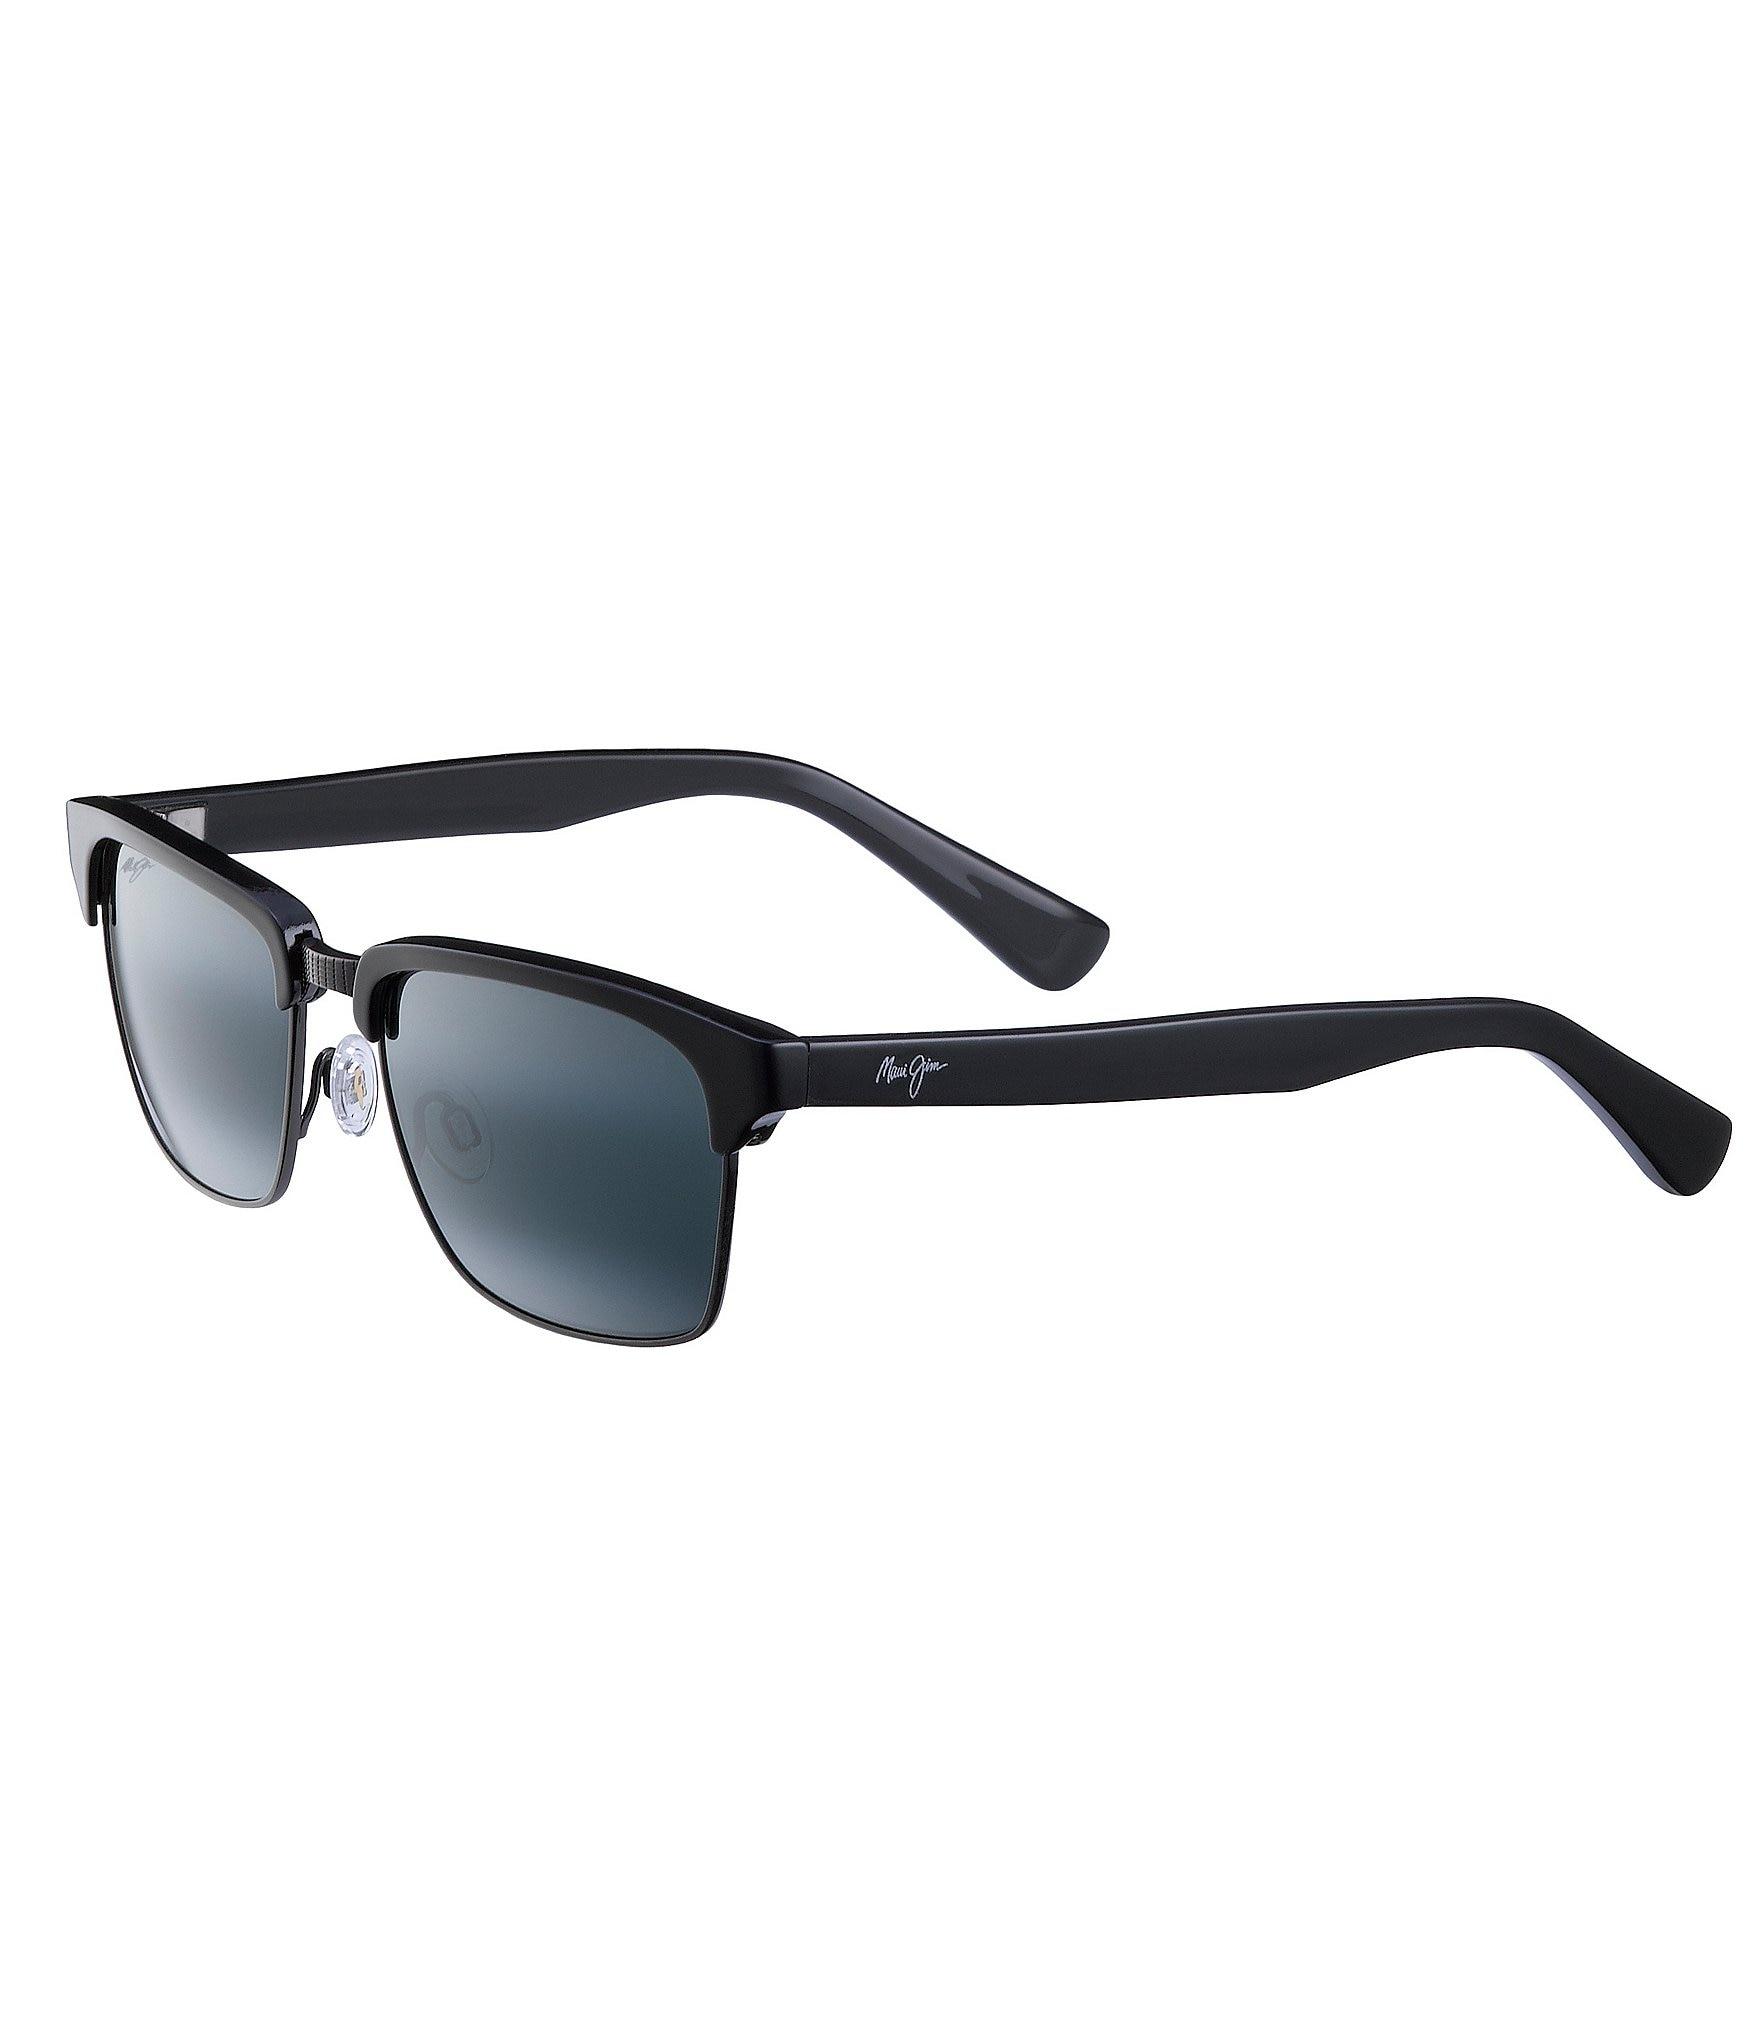 df3e4d35113 Combination Sunglasses   Eyewear